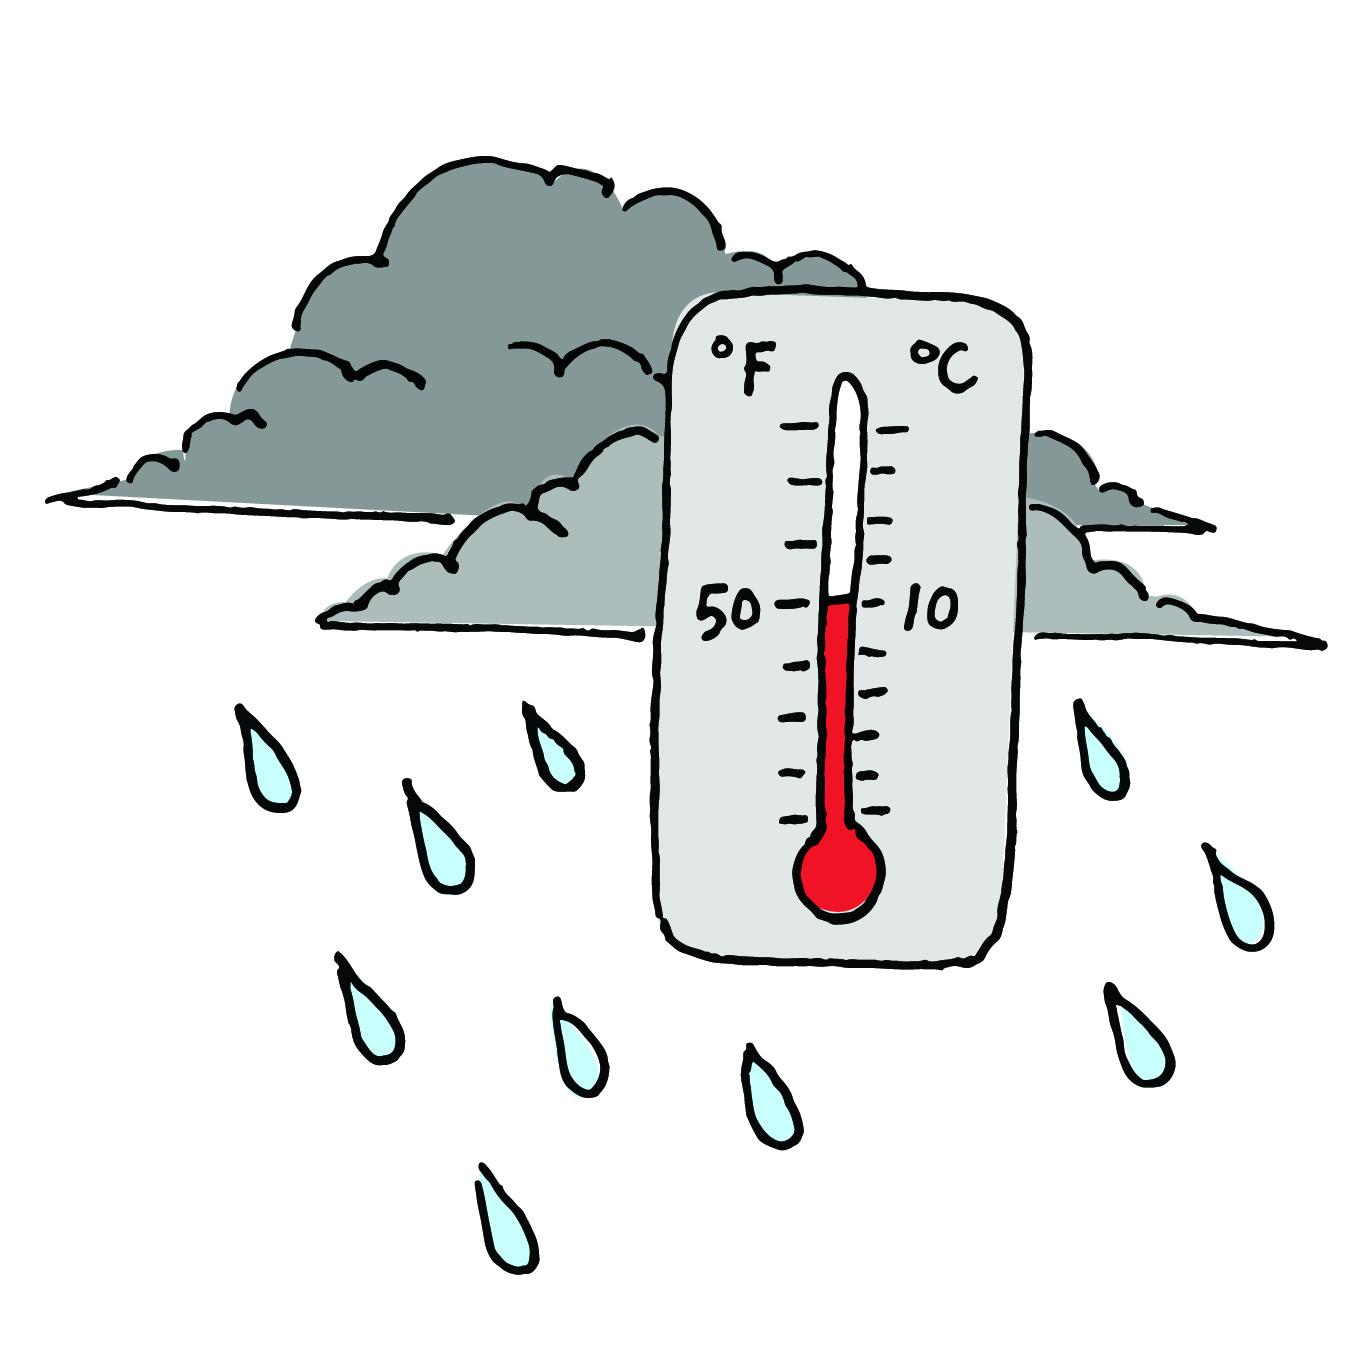 damp, mild climate: clouds, rain, temperature scale